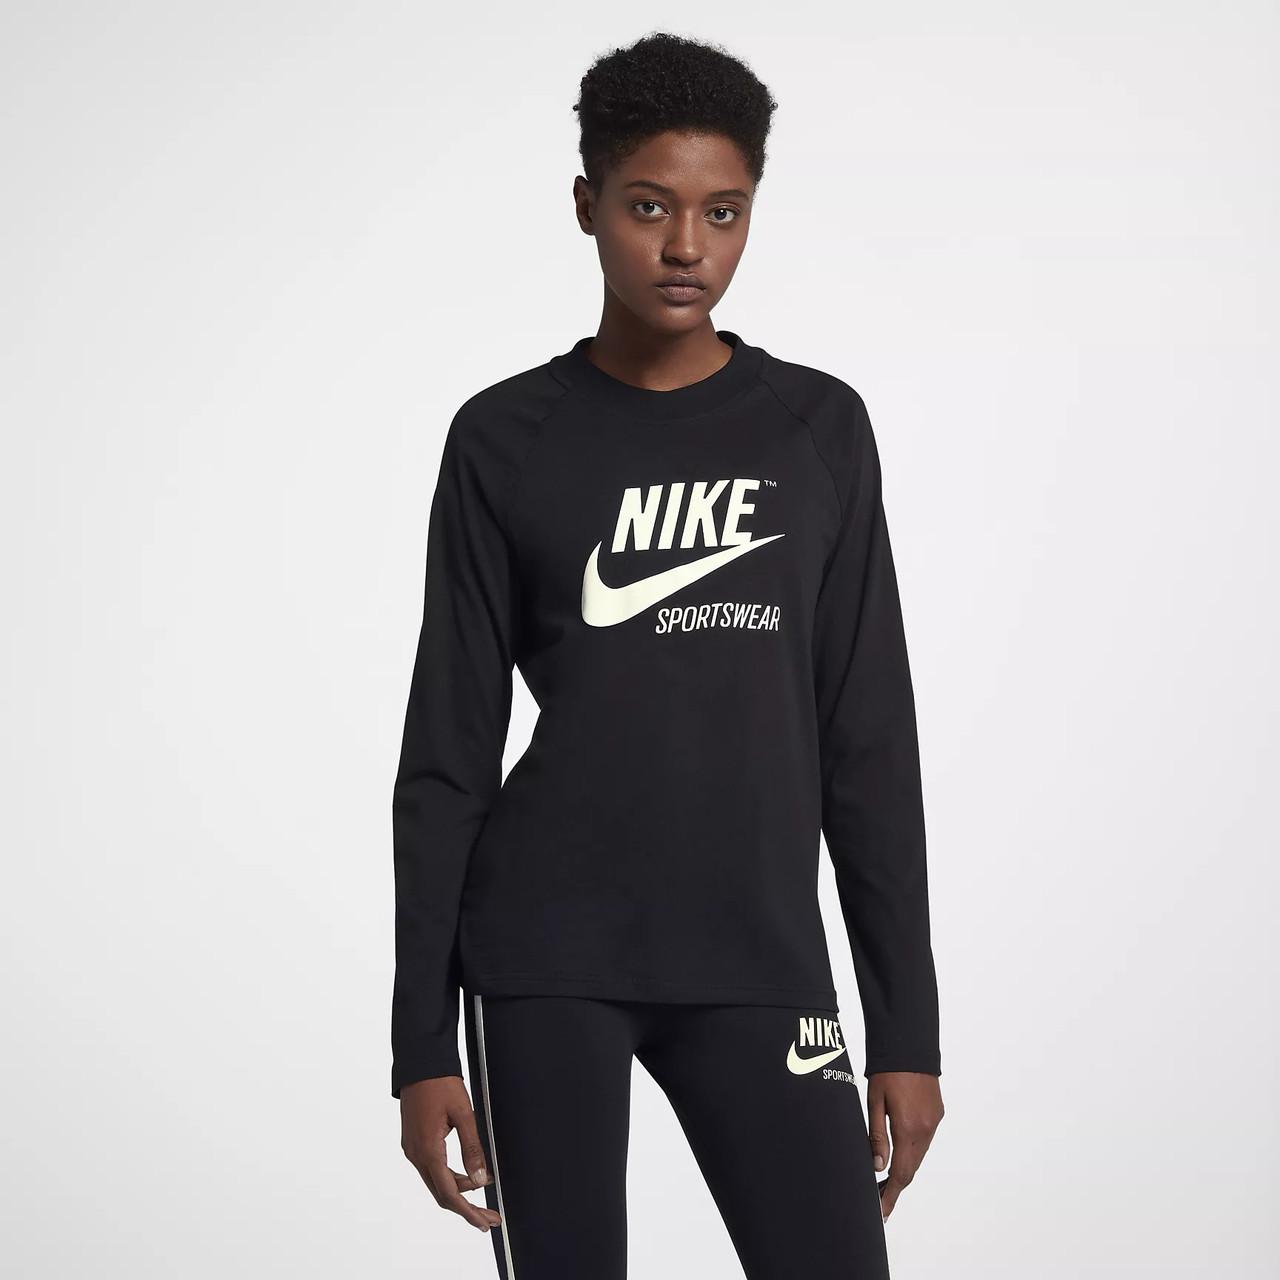 08c85c5a Женская Толстовка Nike Sportswear Long Sleeve Tee 883521-010 (Оригинал)